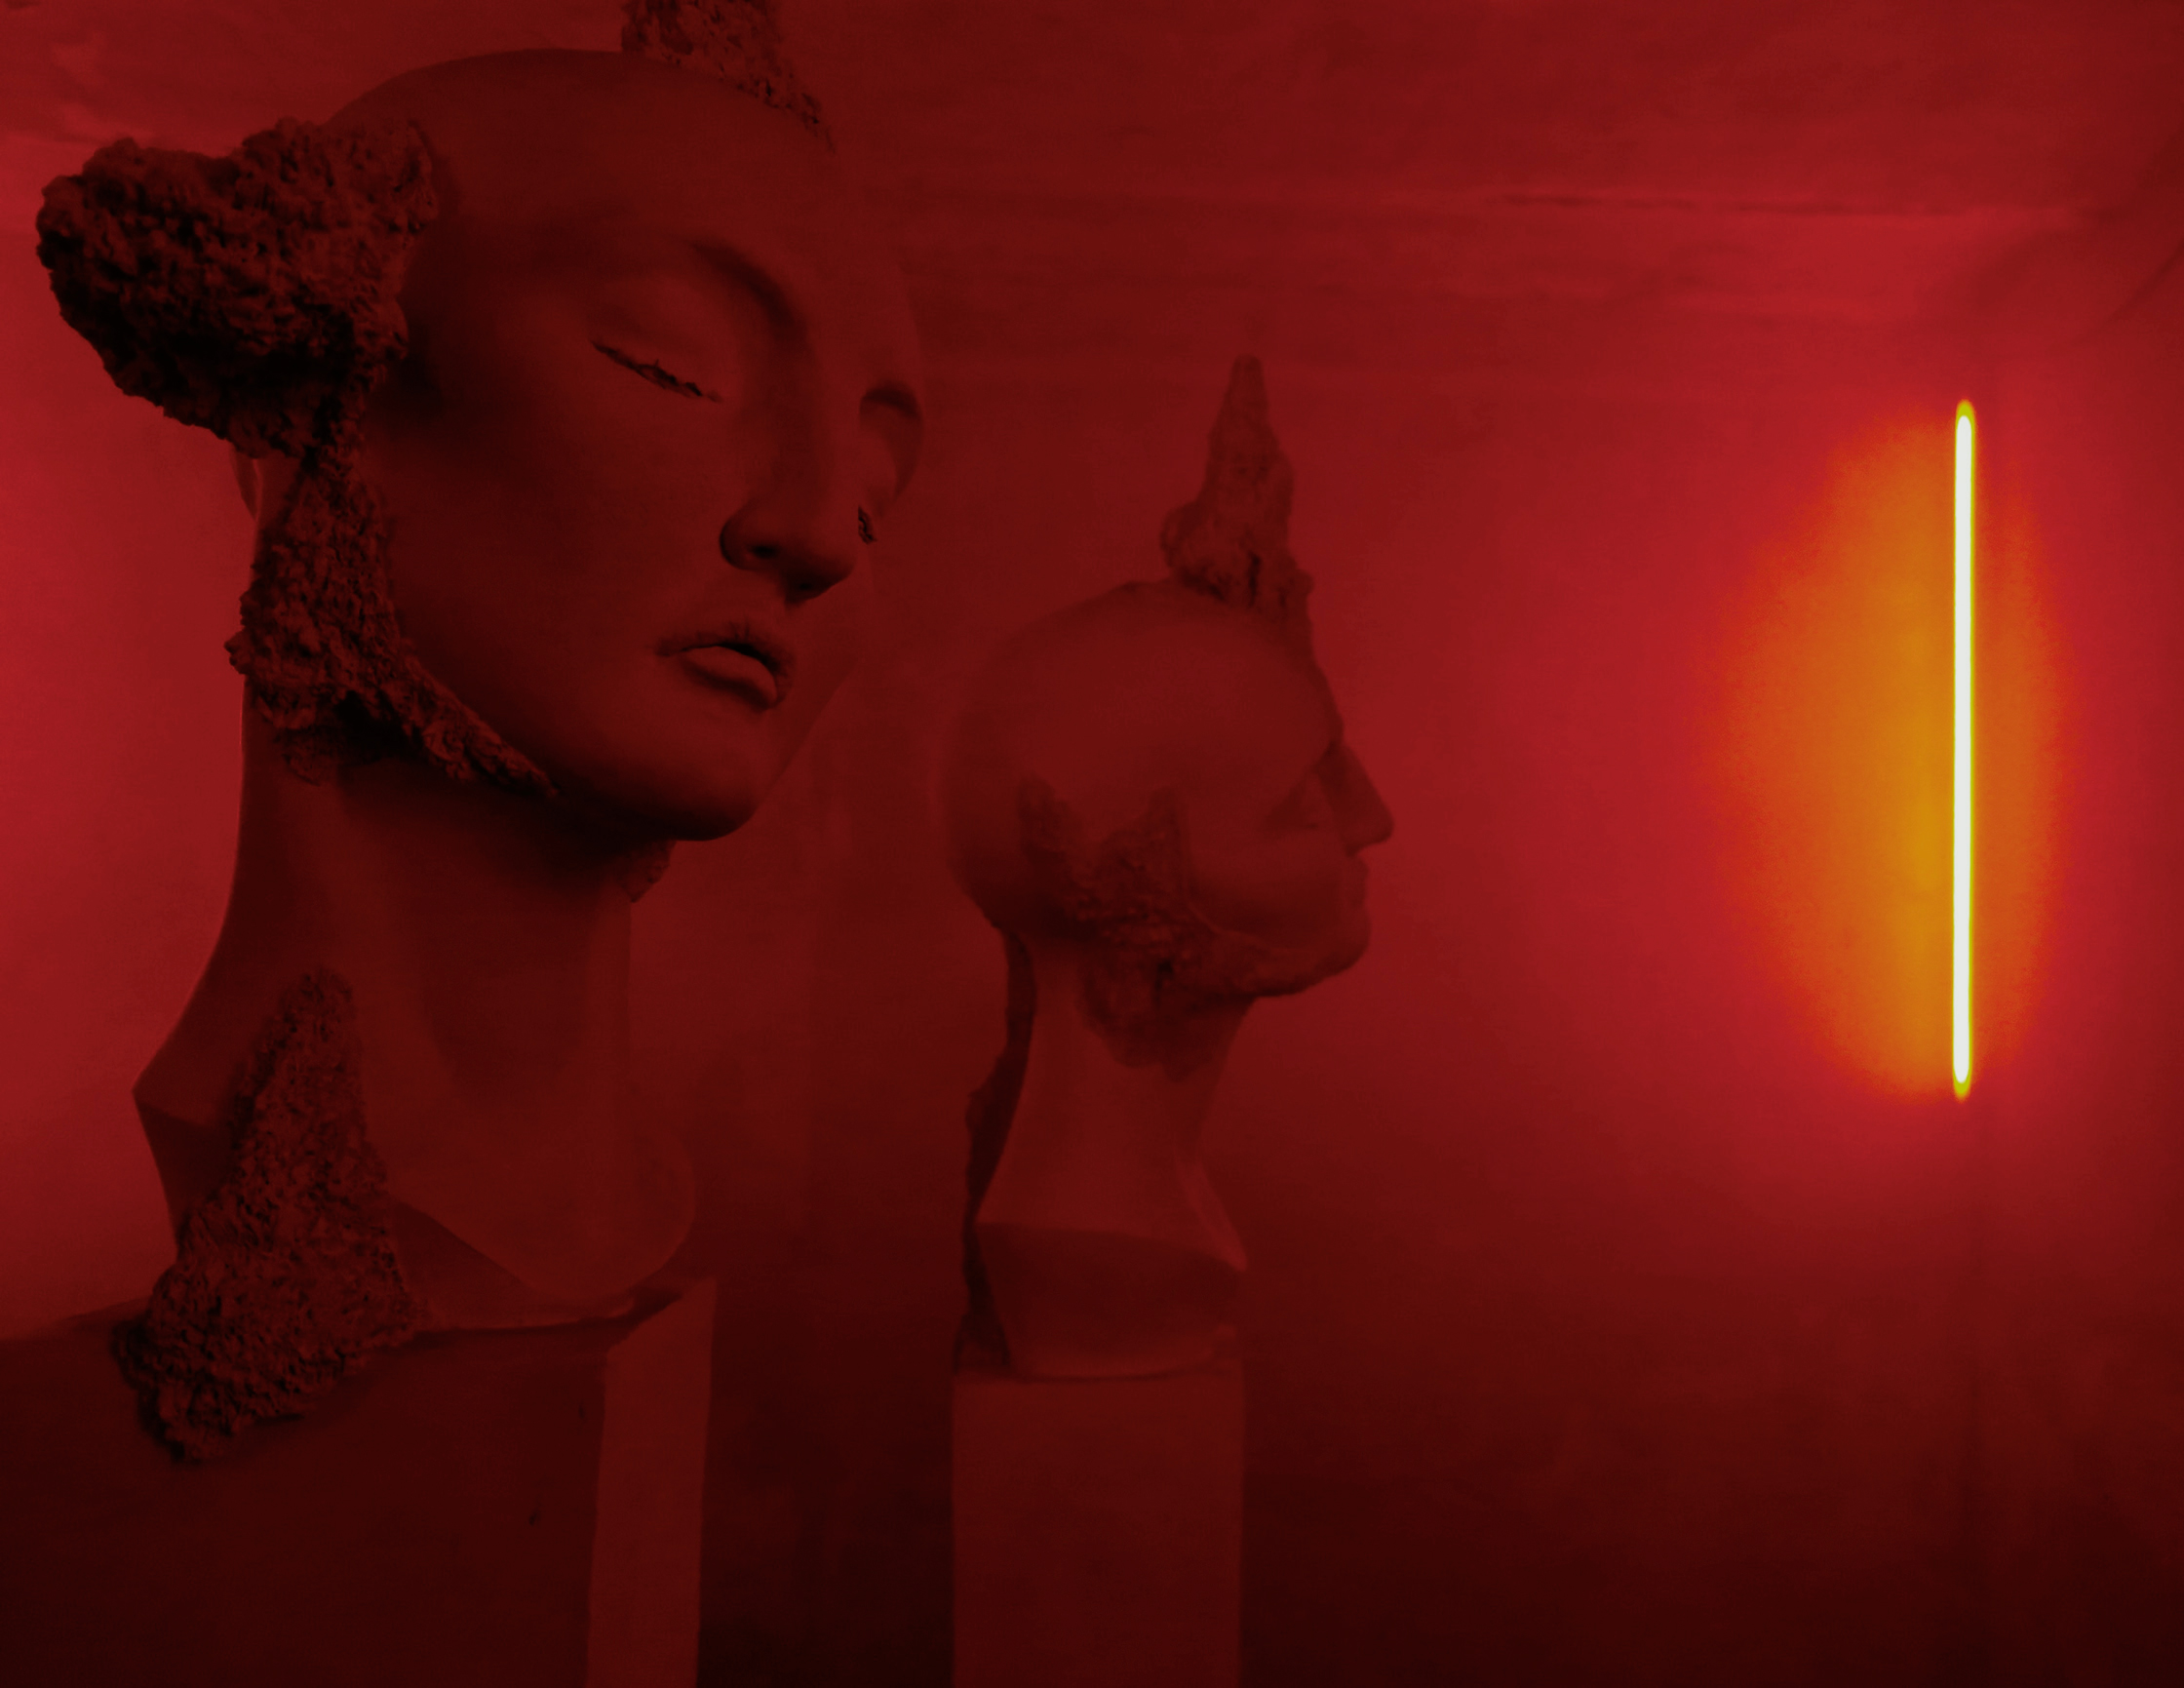 Milan design week haigo exhibition design 3.jpg